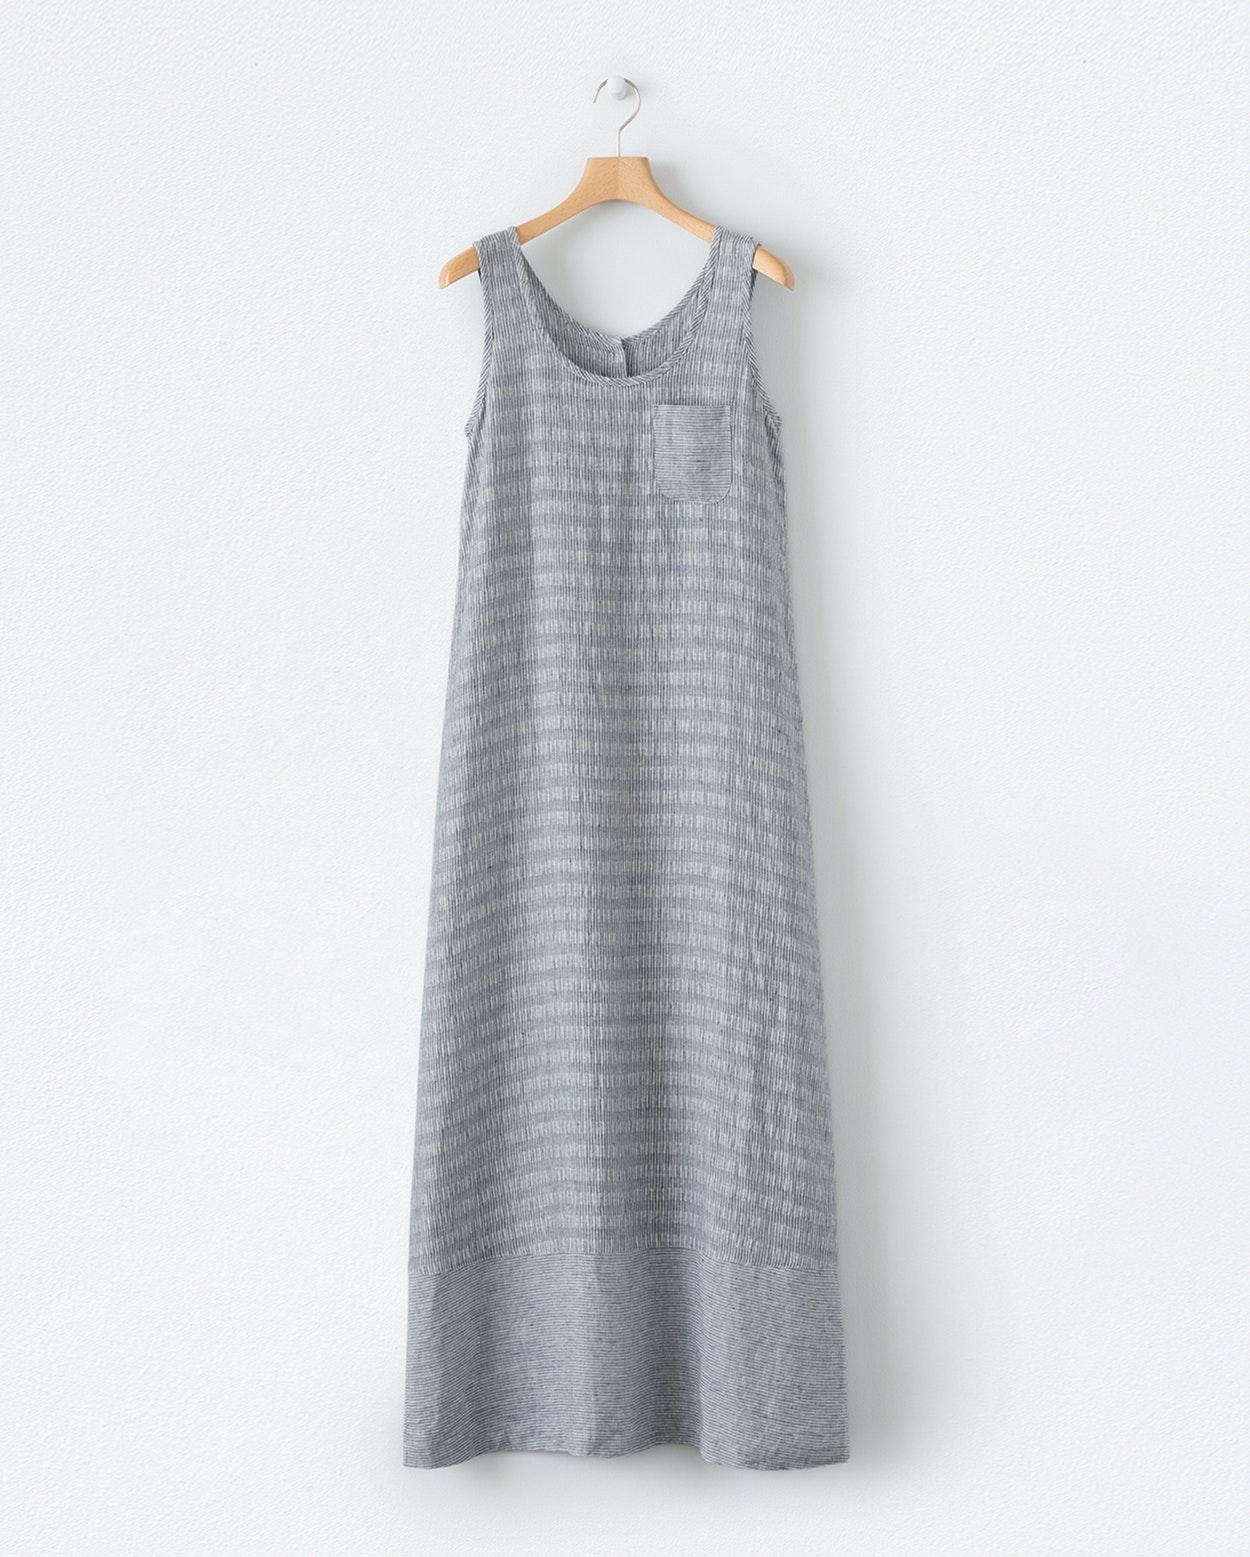 ce97abafff3 ... Product Image of Sleeveless linen dress ...